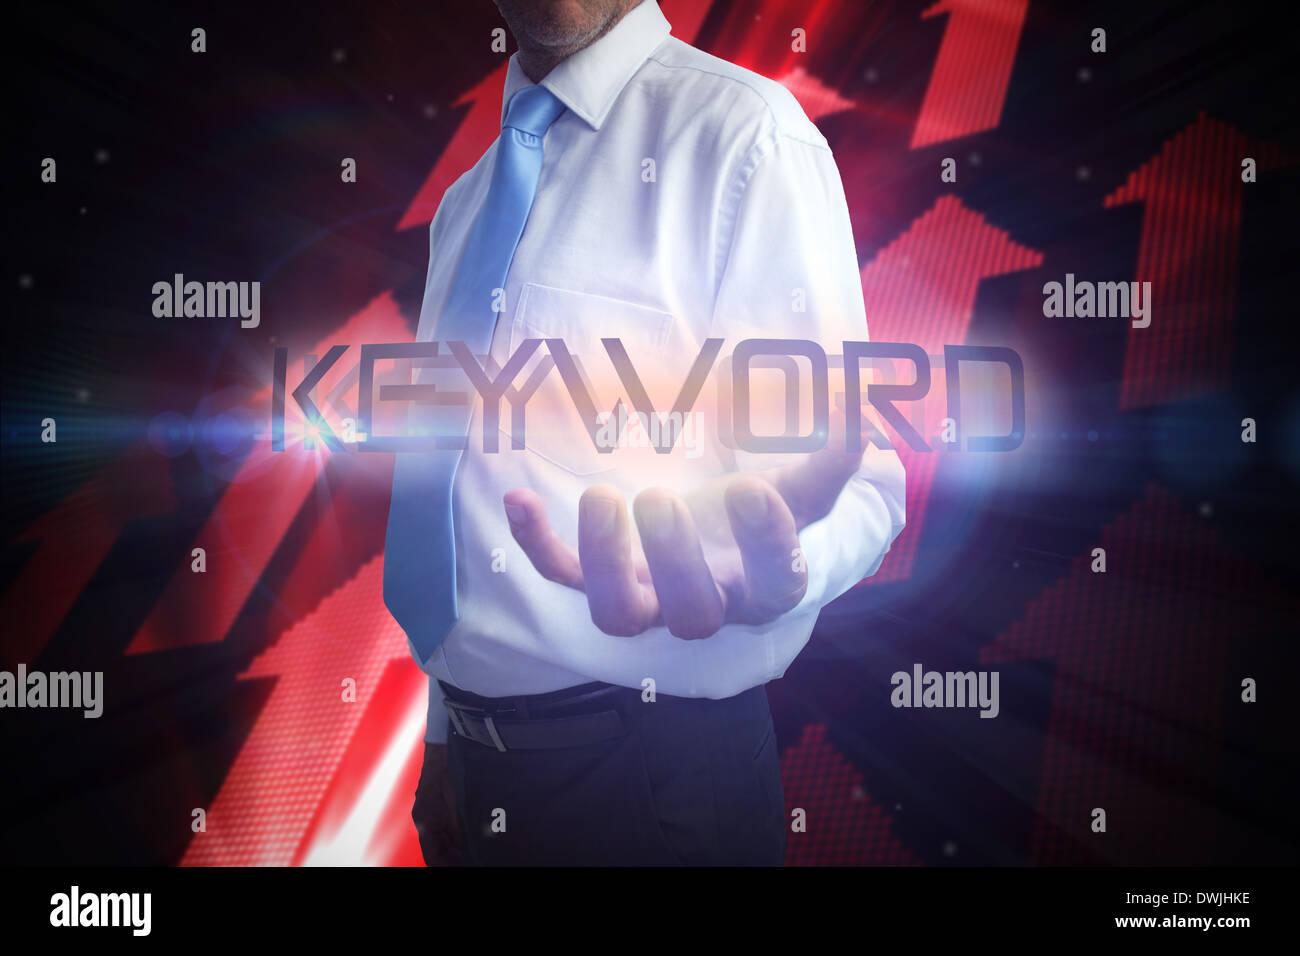 Businessman presenting the word keyword - Stock Image